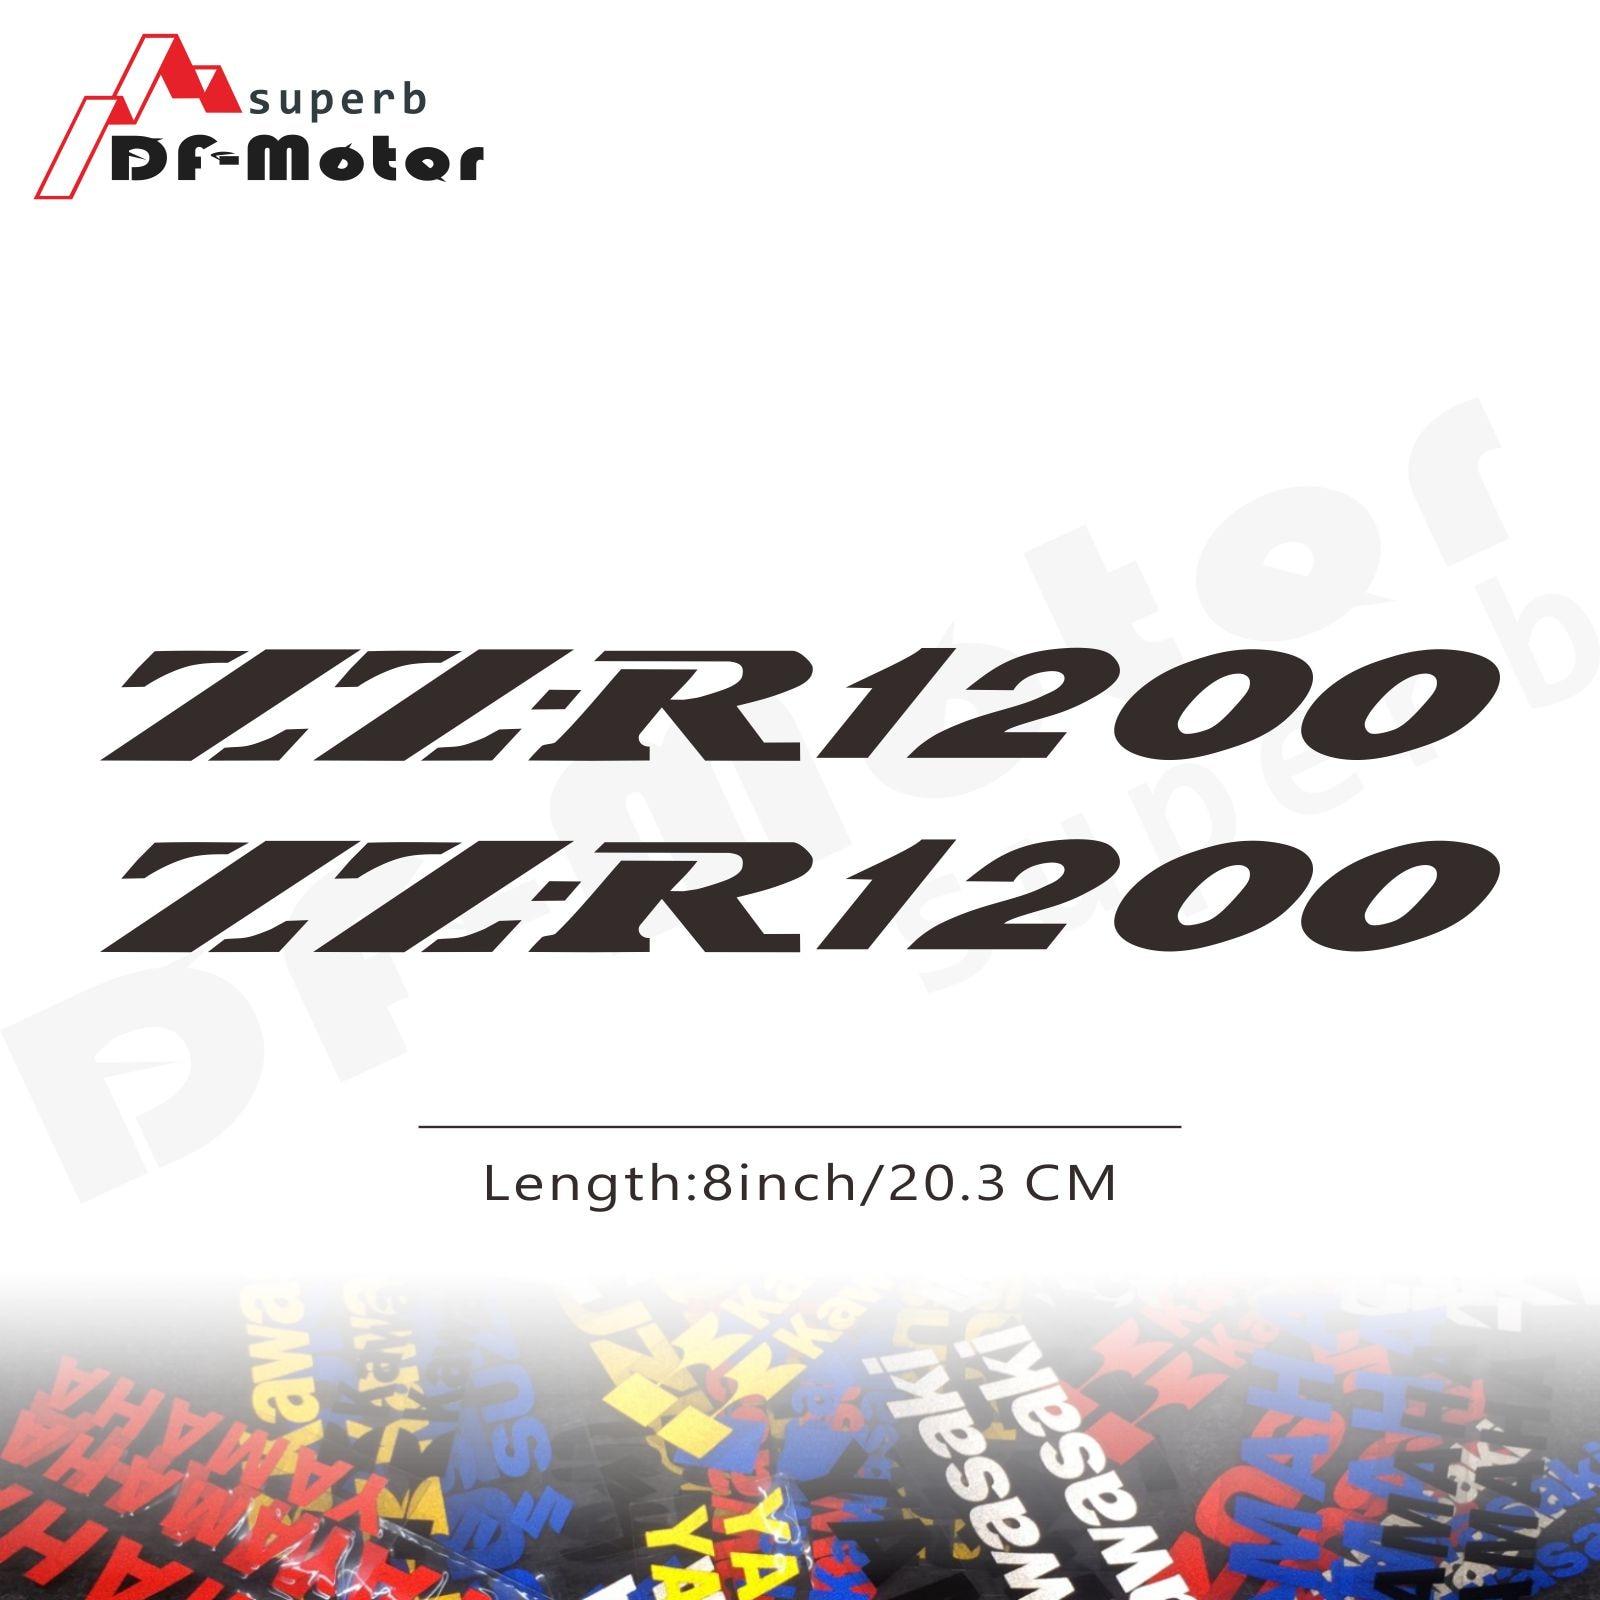 psler Motorcycle Wheel Rim Interior Decals Reflective Stickers For Kawasaki Ninja 250